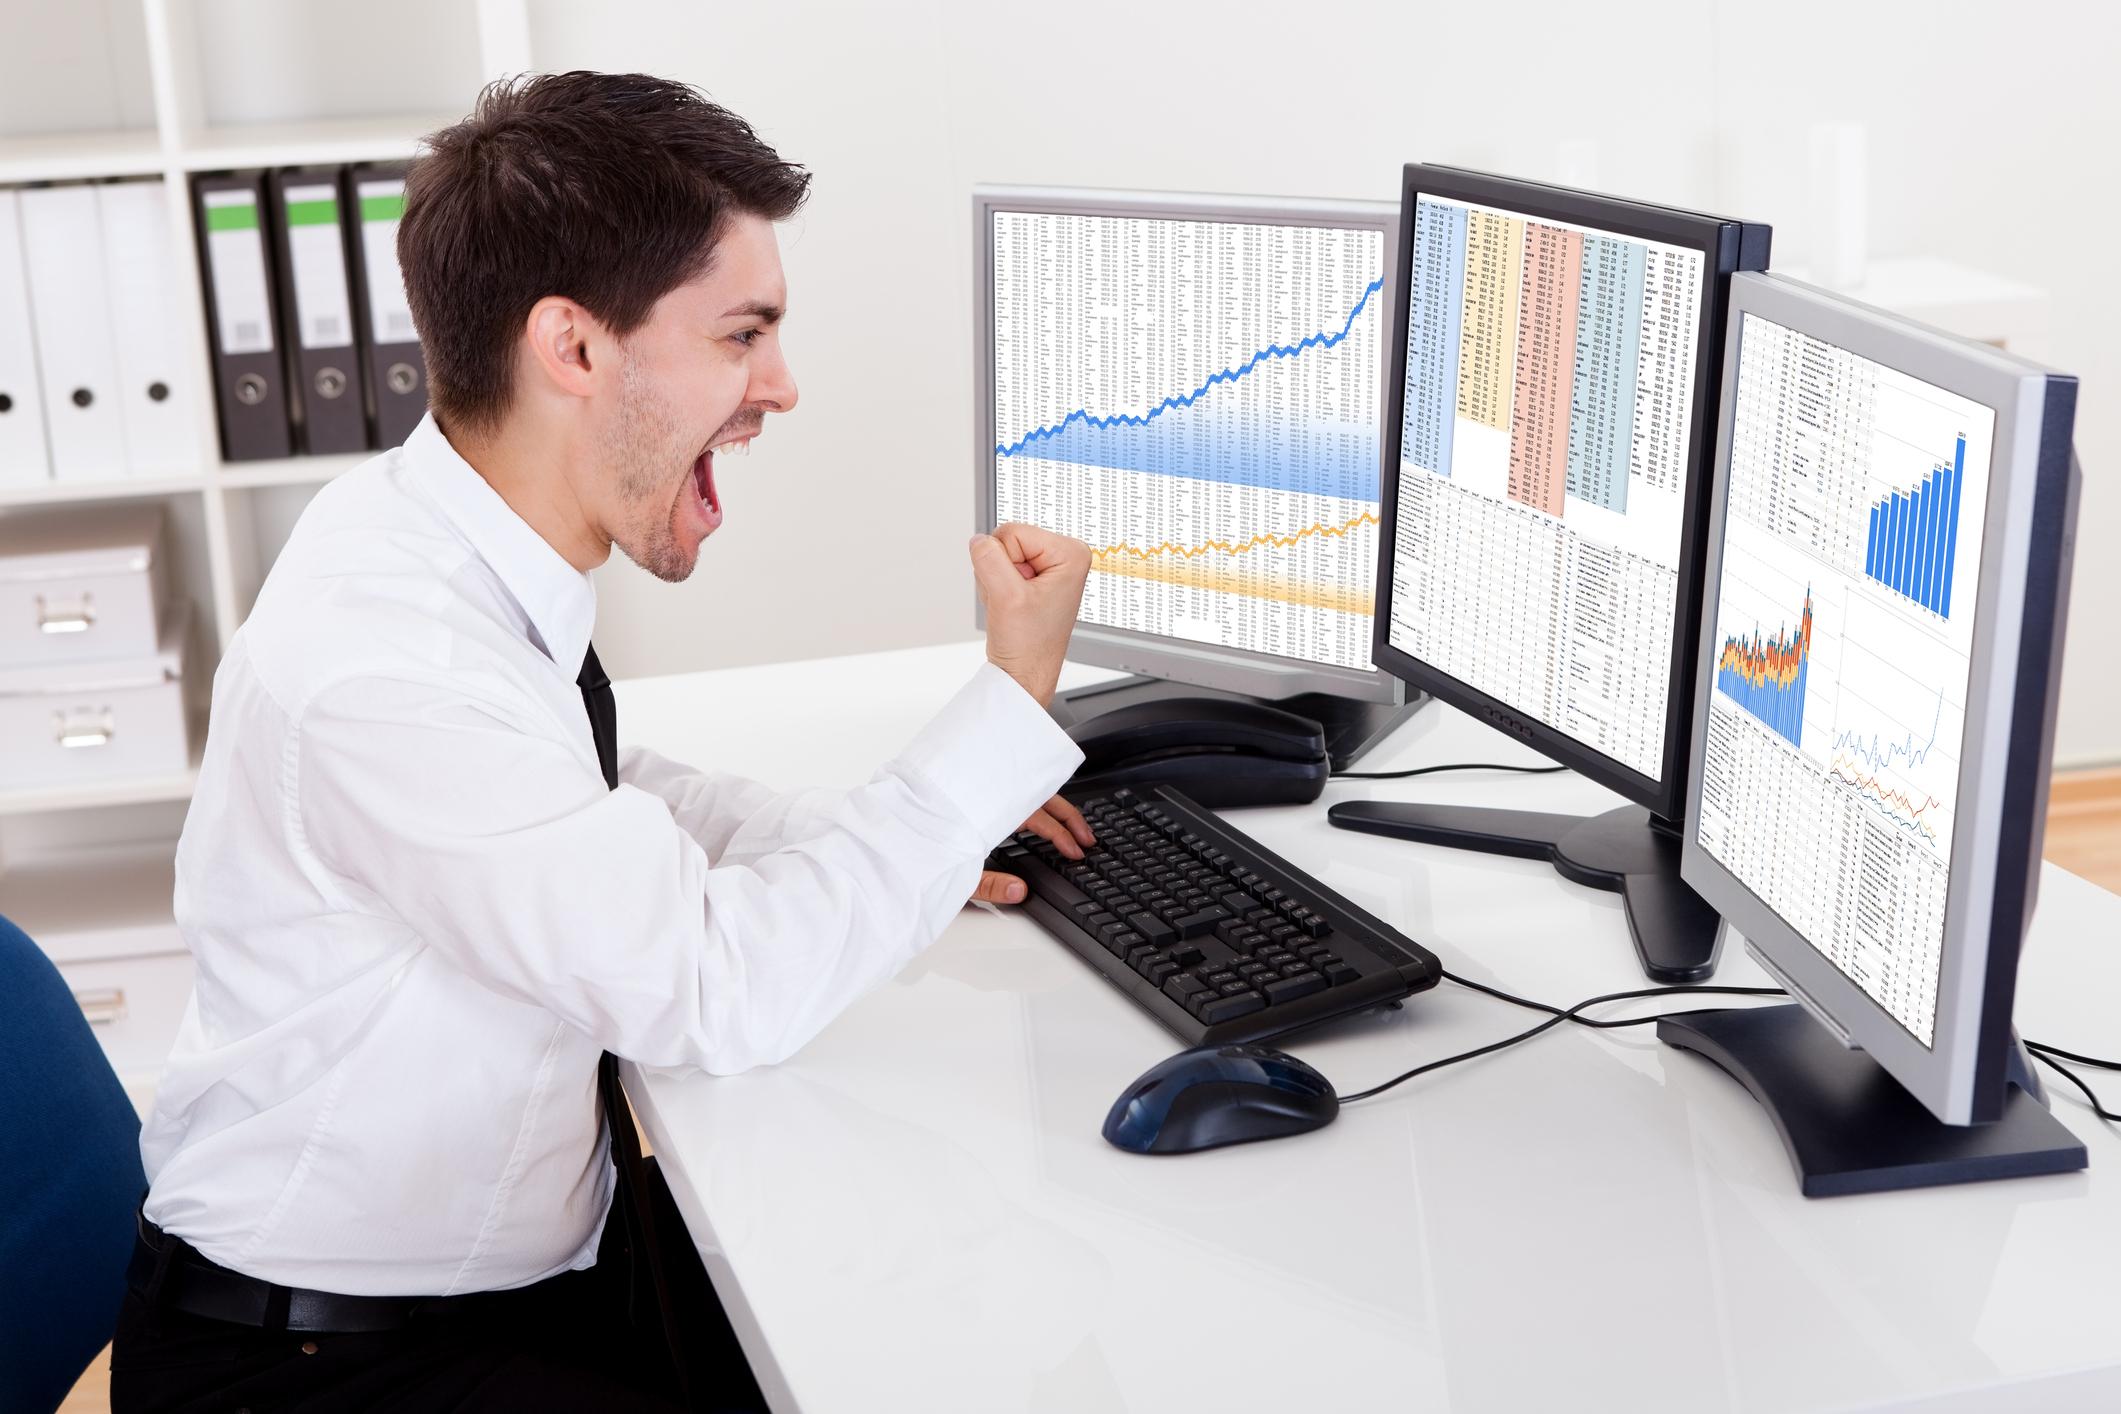 Fist-pumping stock trader in front of monitors displaying upward sloping charts.